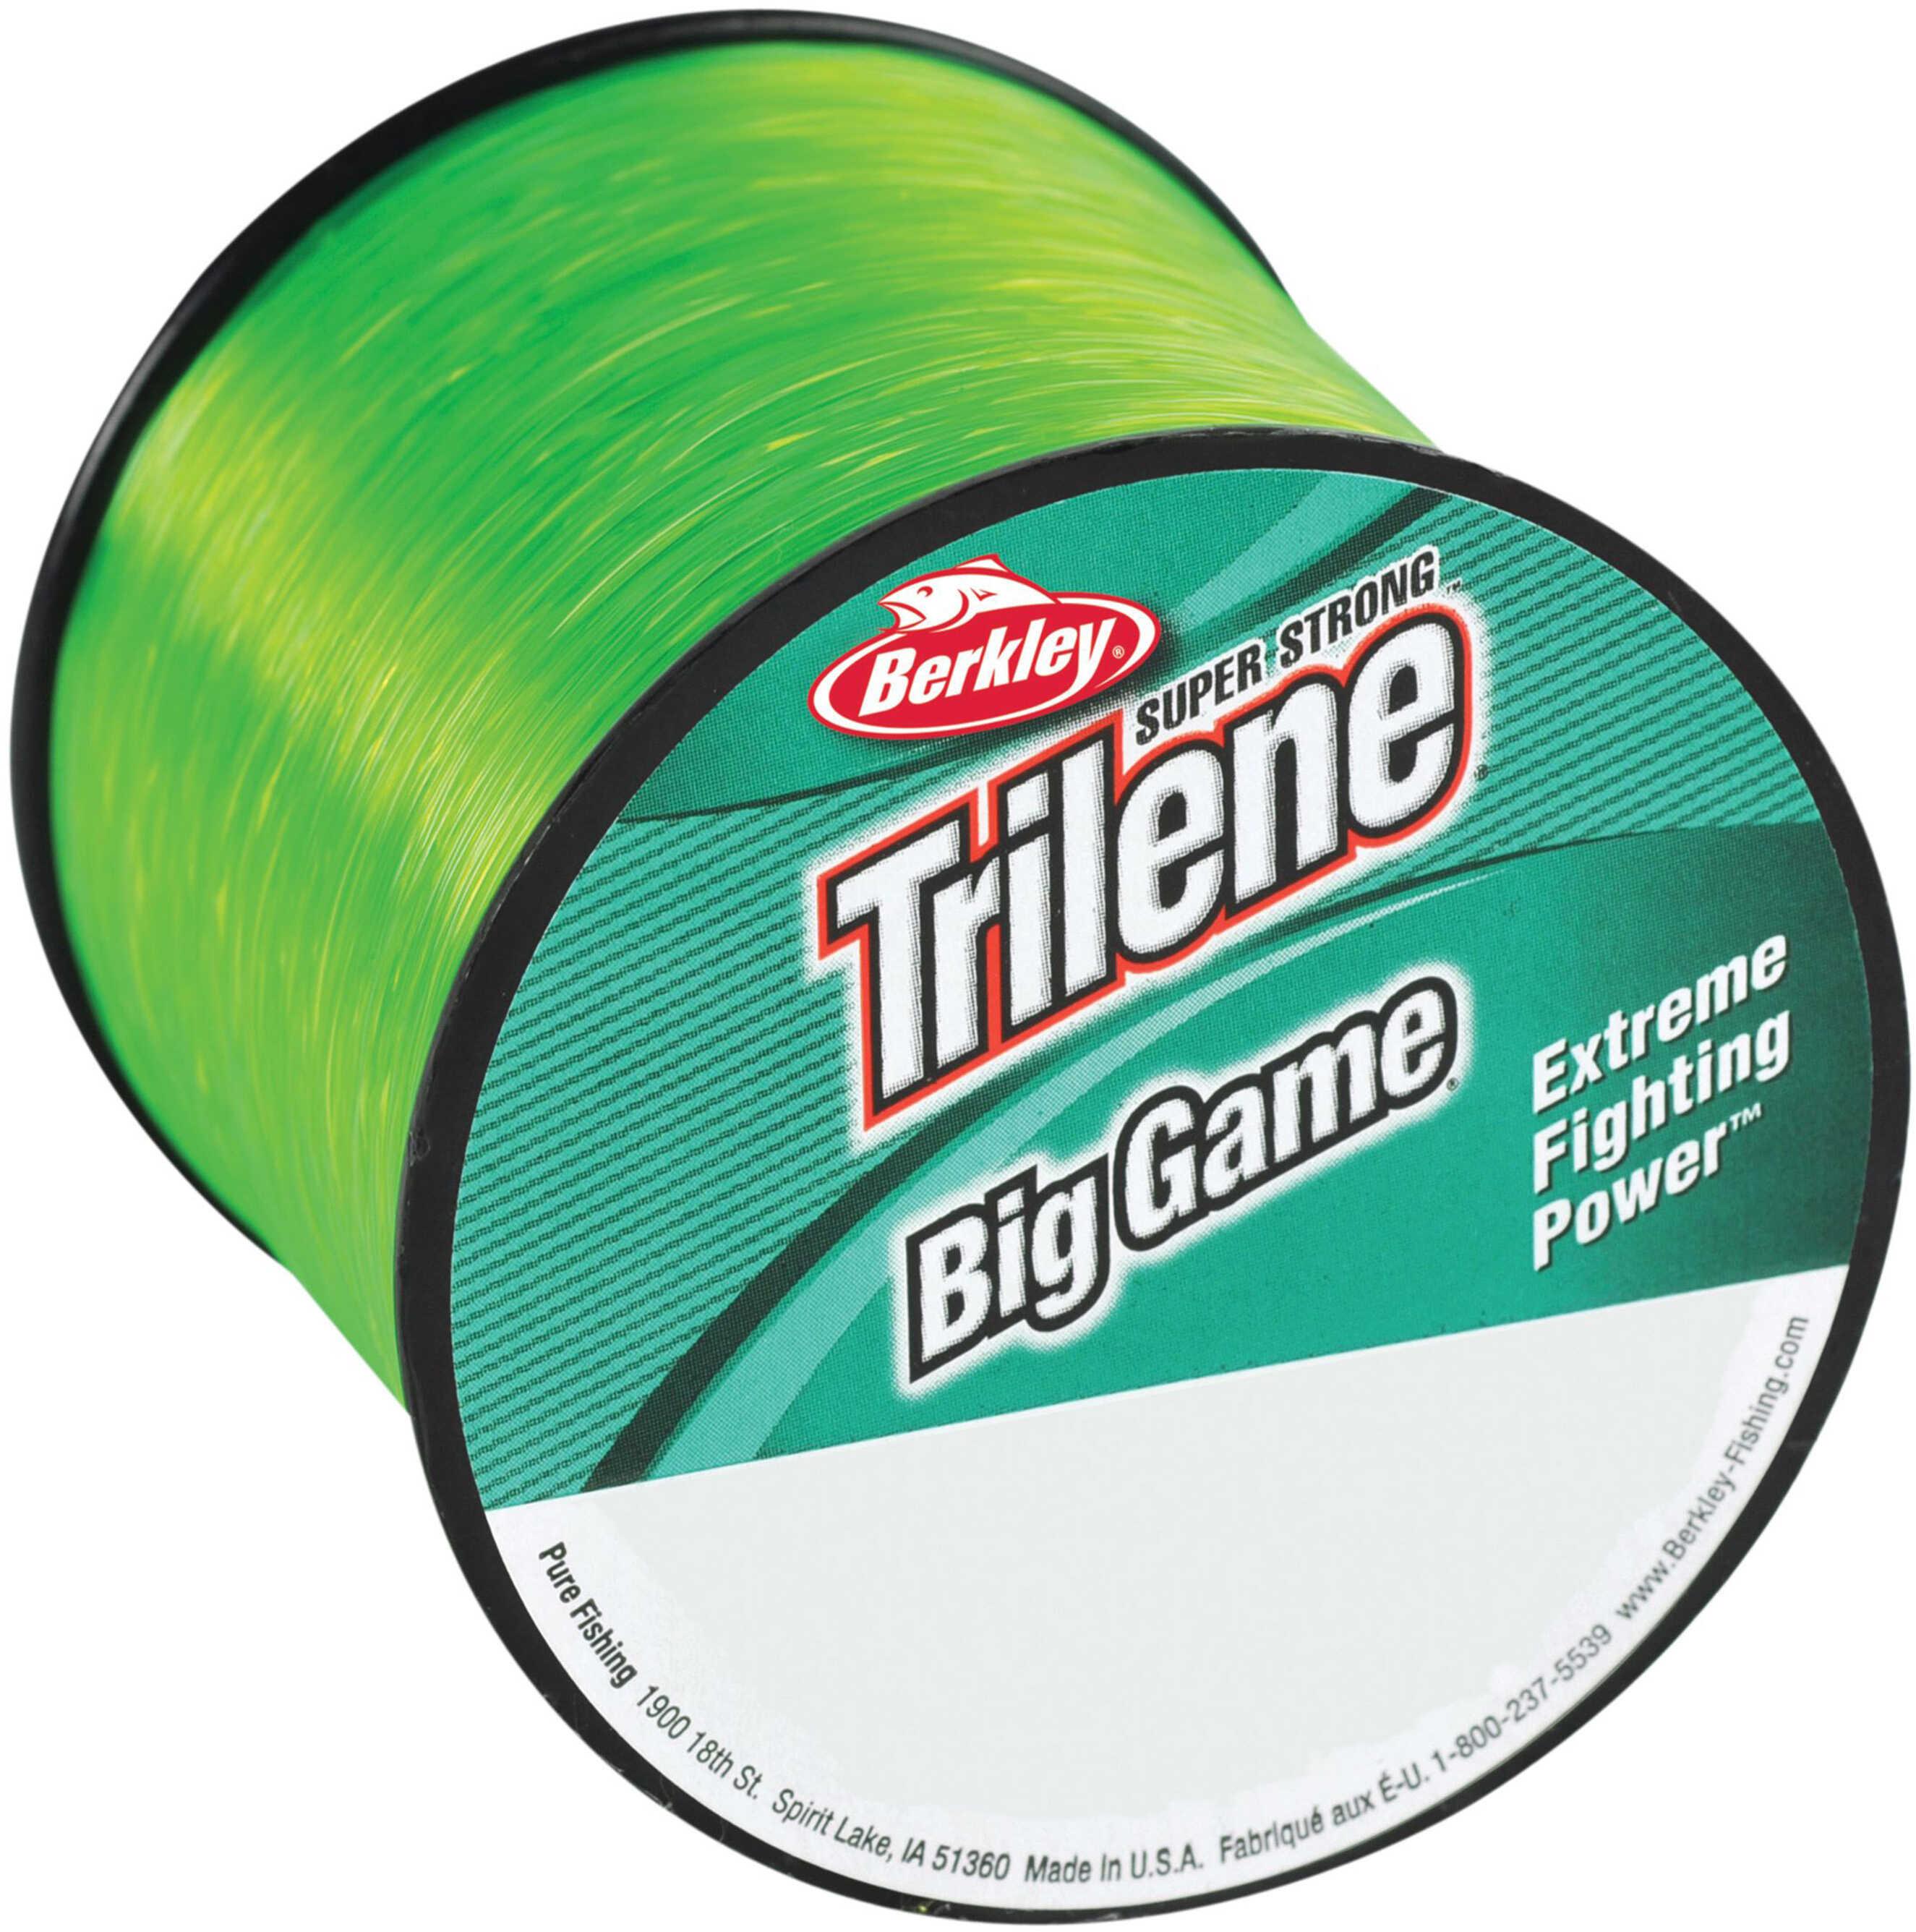 Berkley Trilene Big Game 1/4 lb Spool, 50 lb 275 Yard, Soalr, 4 Pack 1079076